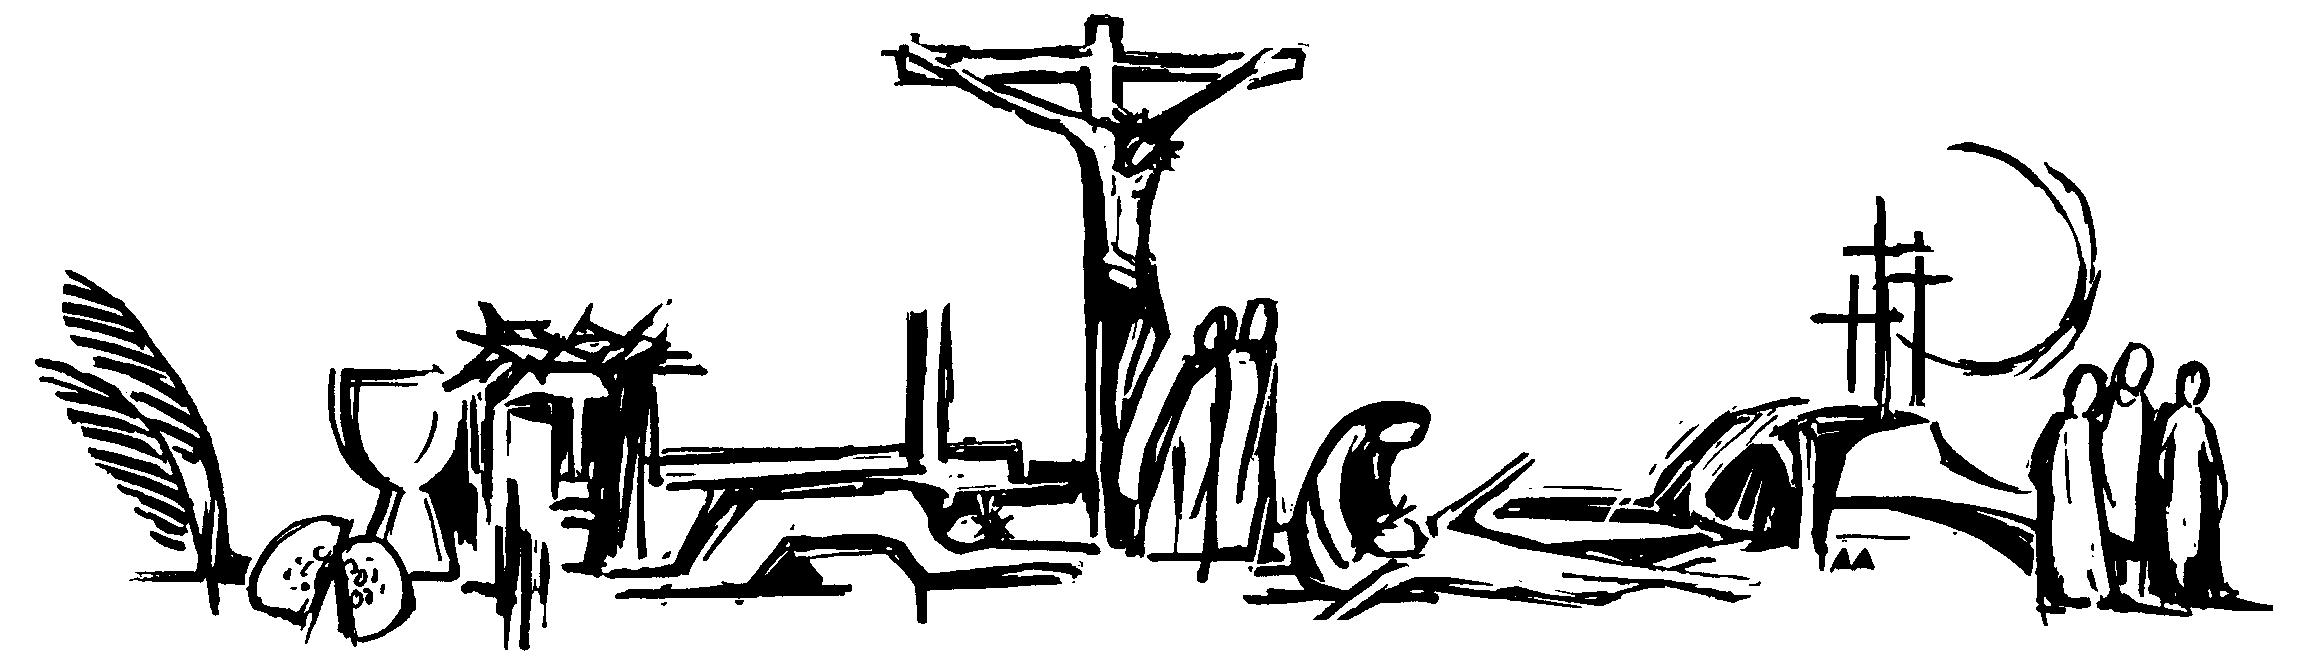 clip art Free download clip art. Lent clipart black and white.